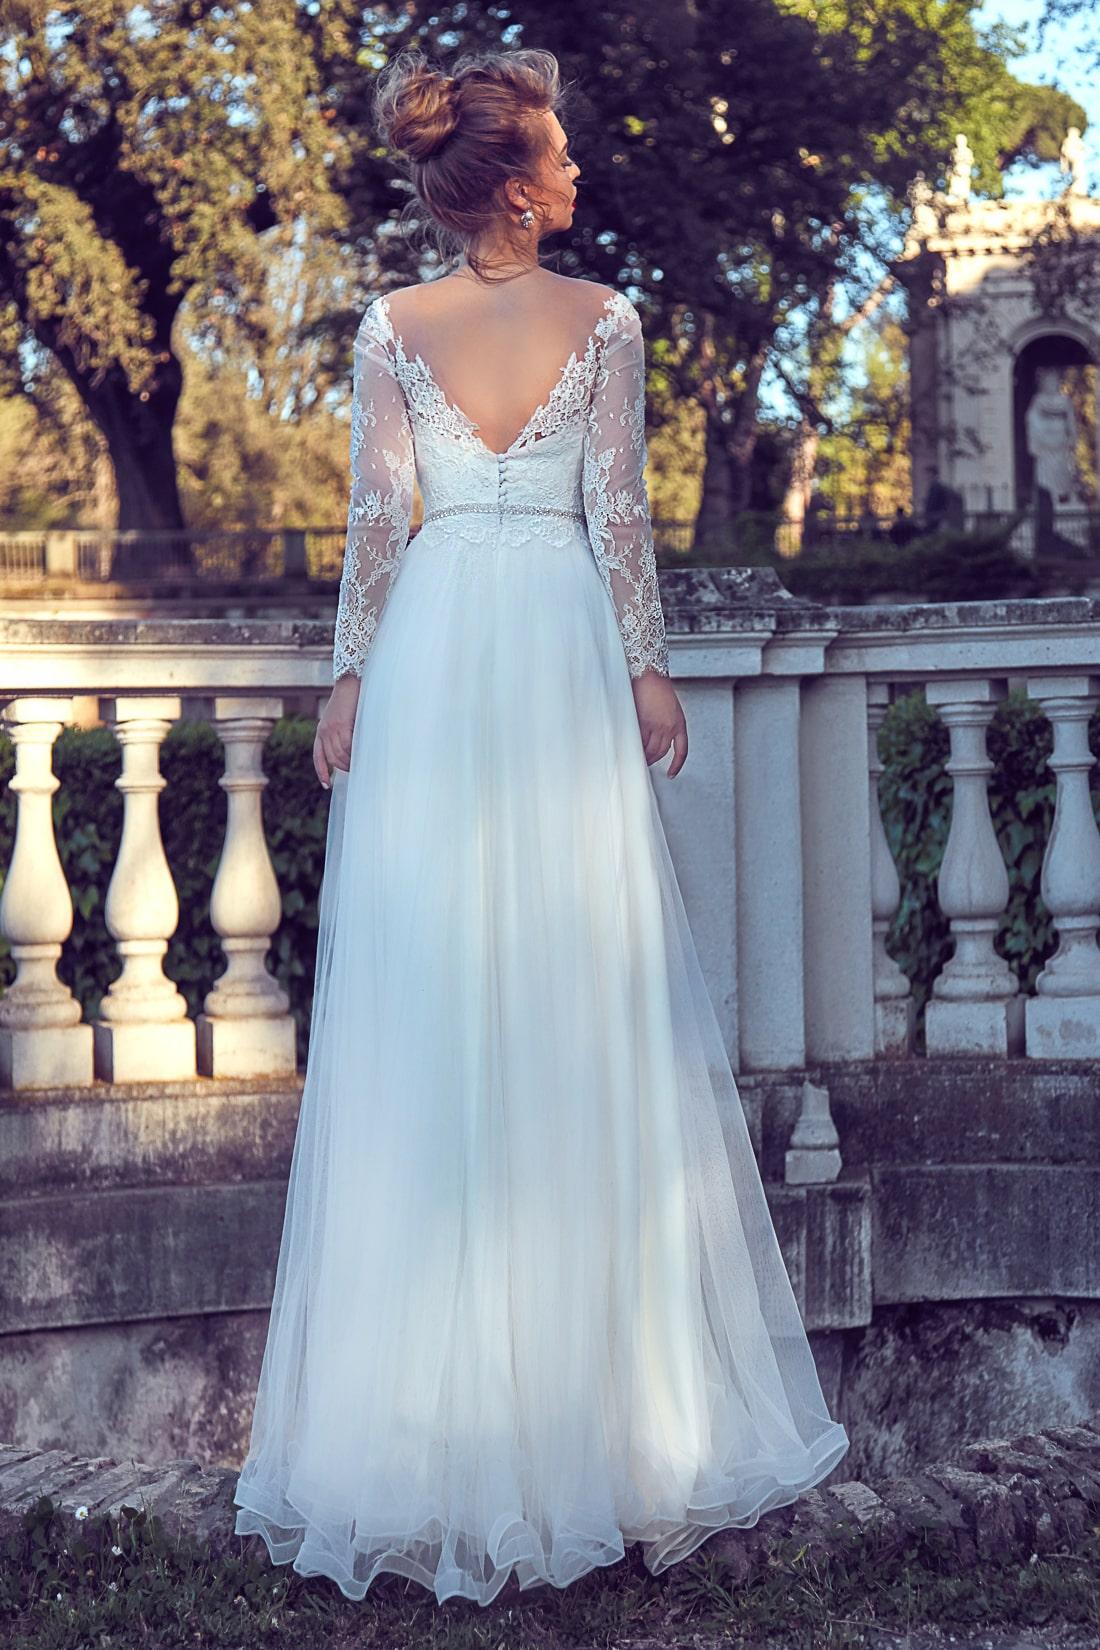 Nieve Model - Colectia Roma - Adora Sposa (2)